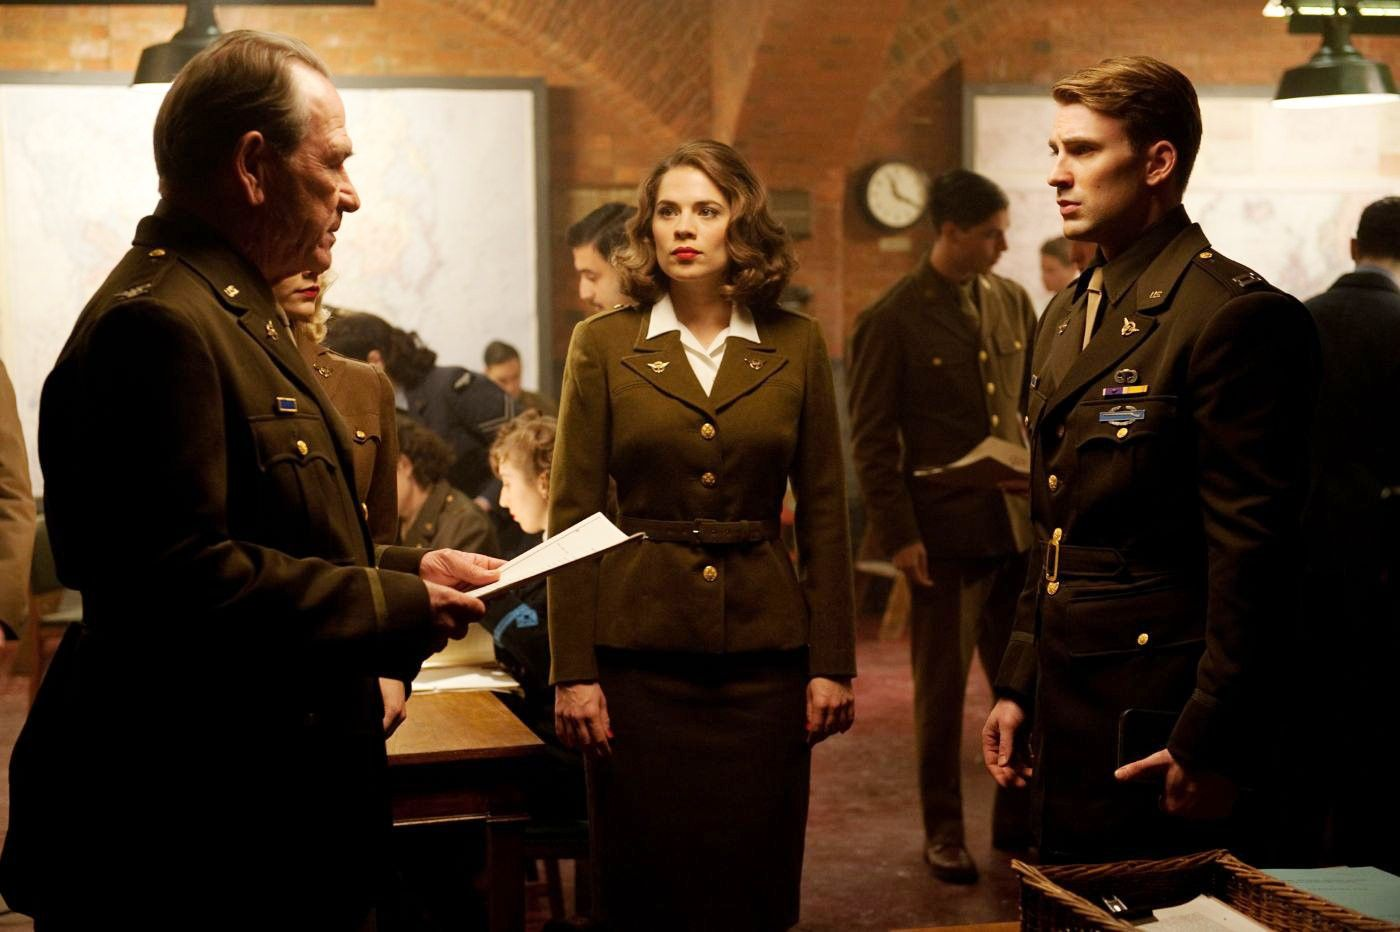 Peggy Carter, by Captain America film. Militar 50's Clothe